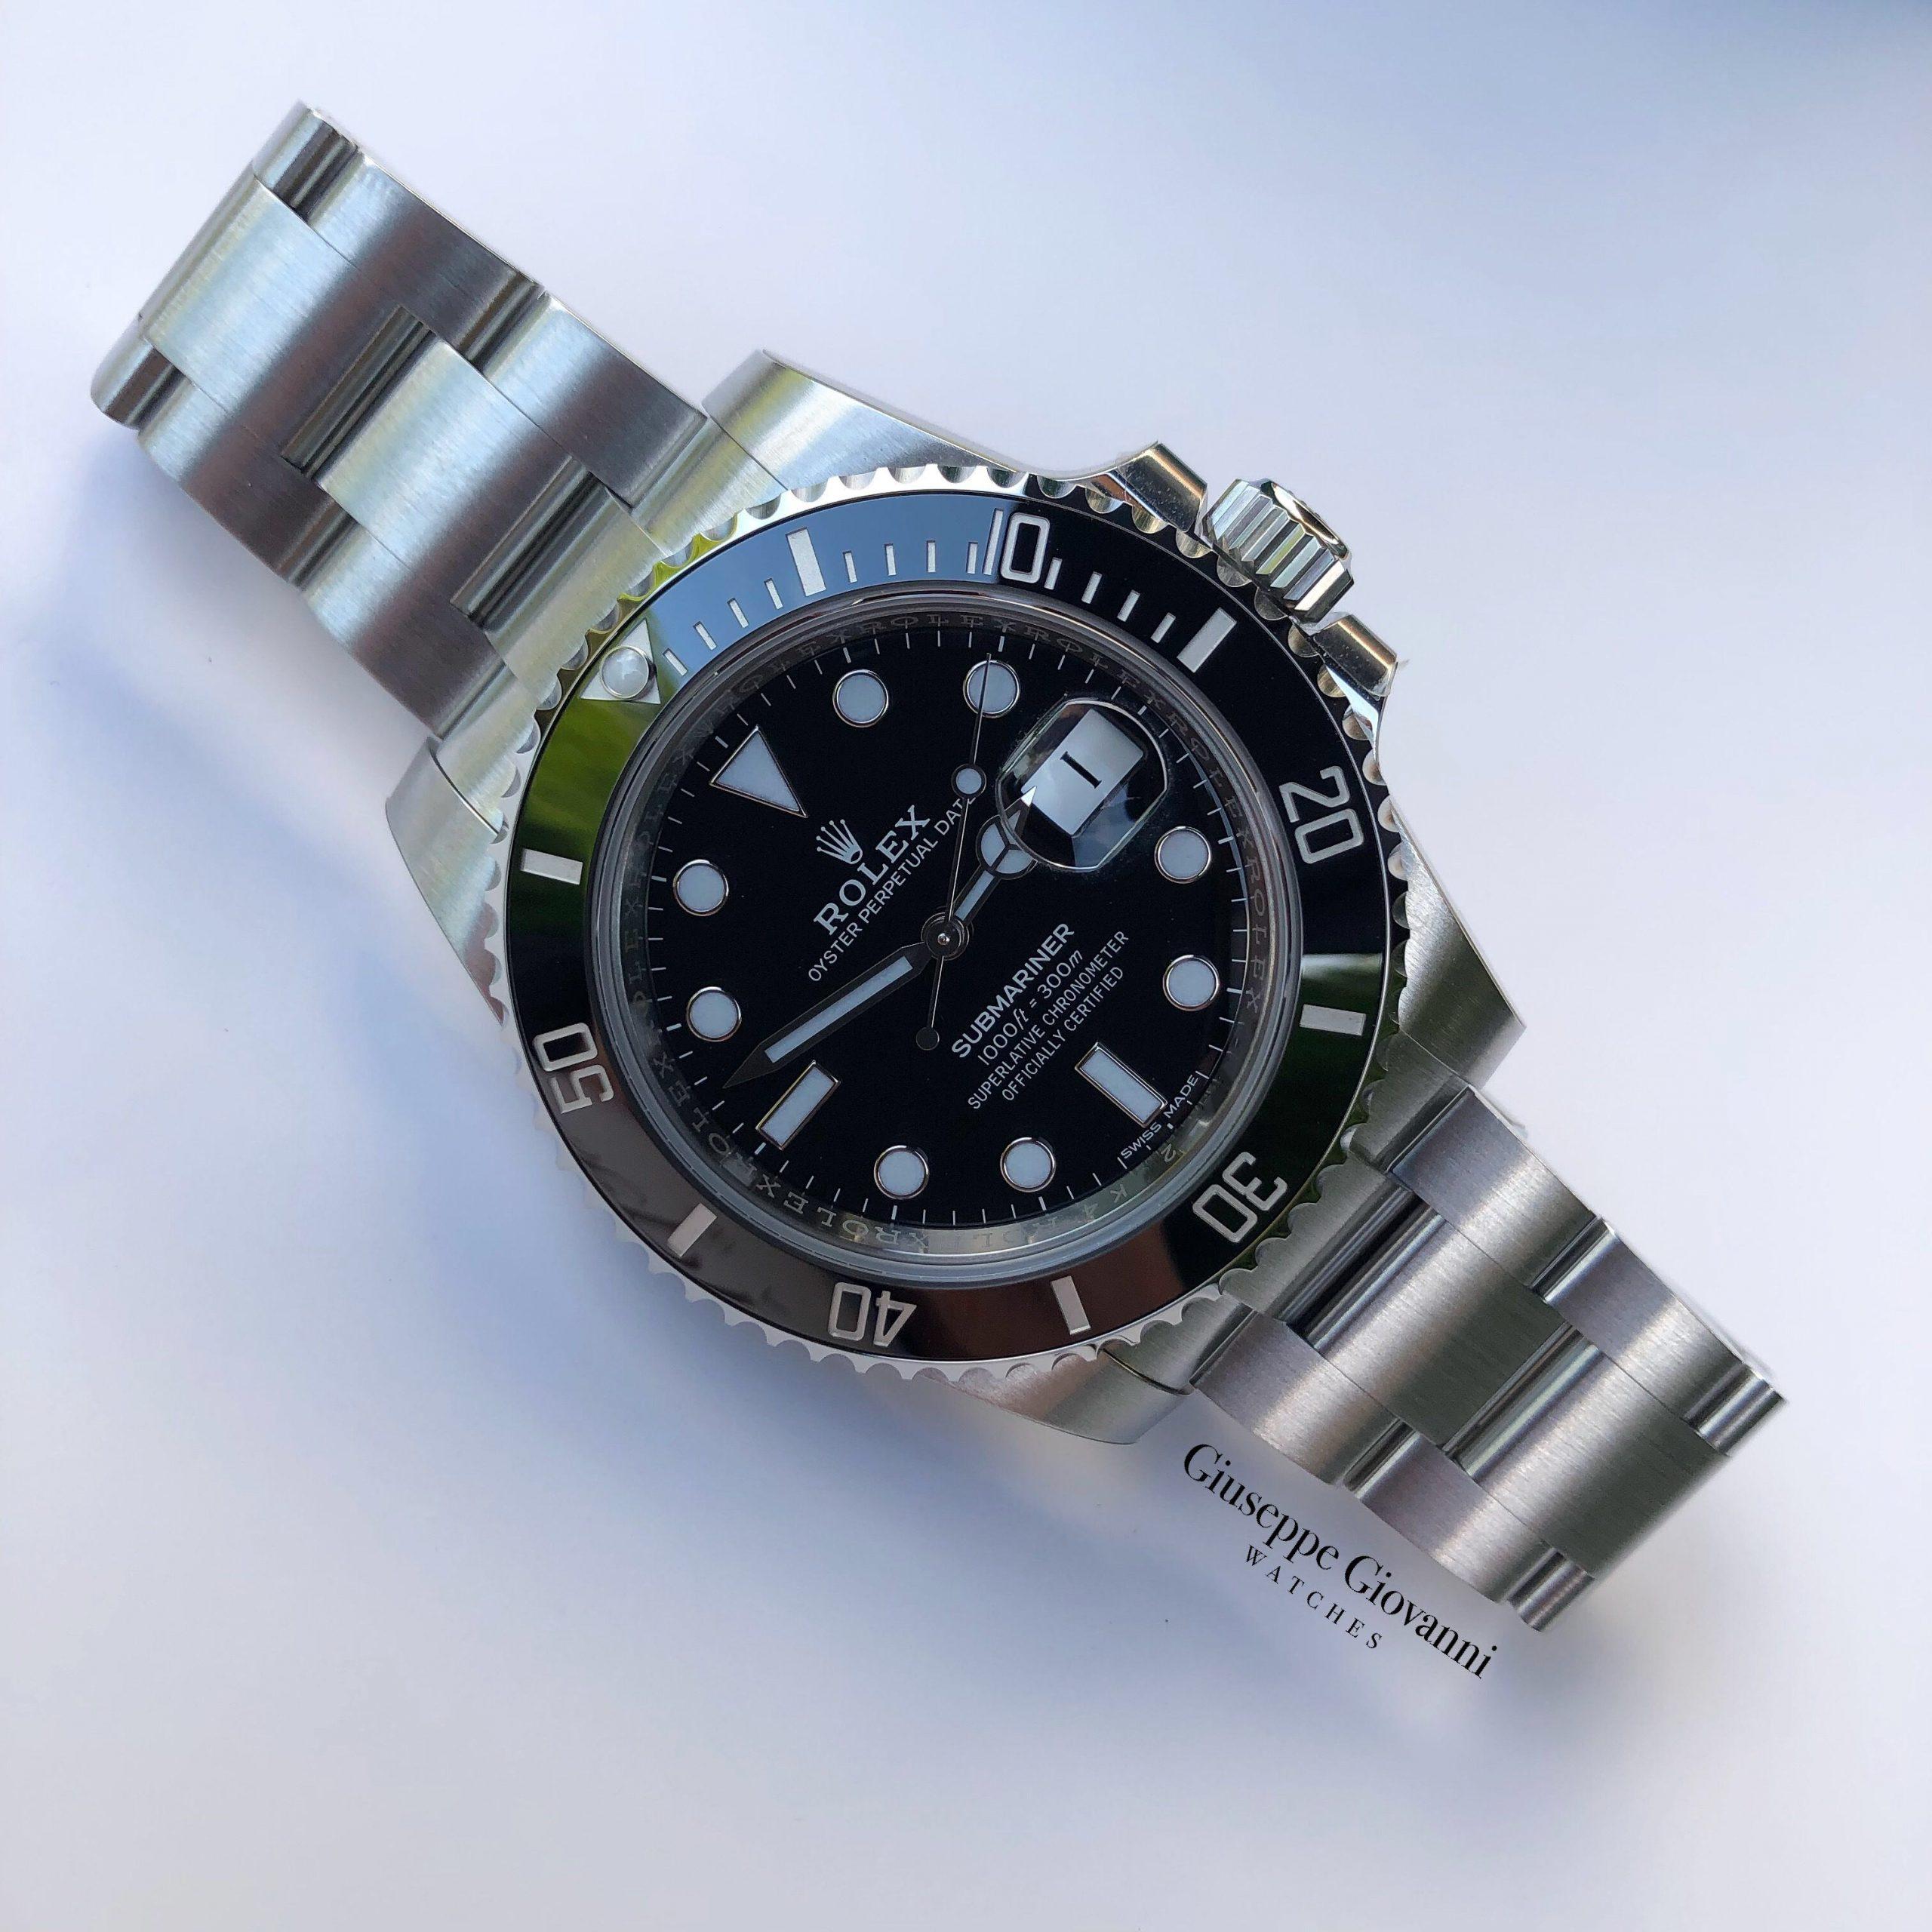 Rolex Submariner date 116610LN Oystersteel Black Dial Oyster Bracelet 2018 1